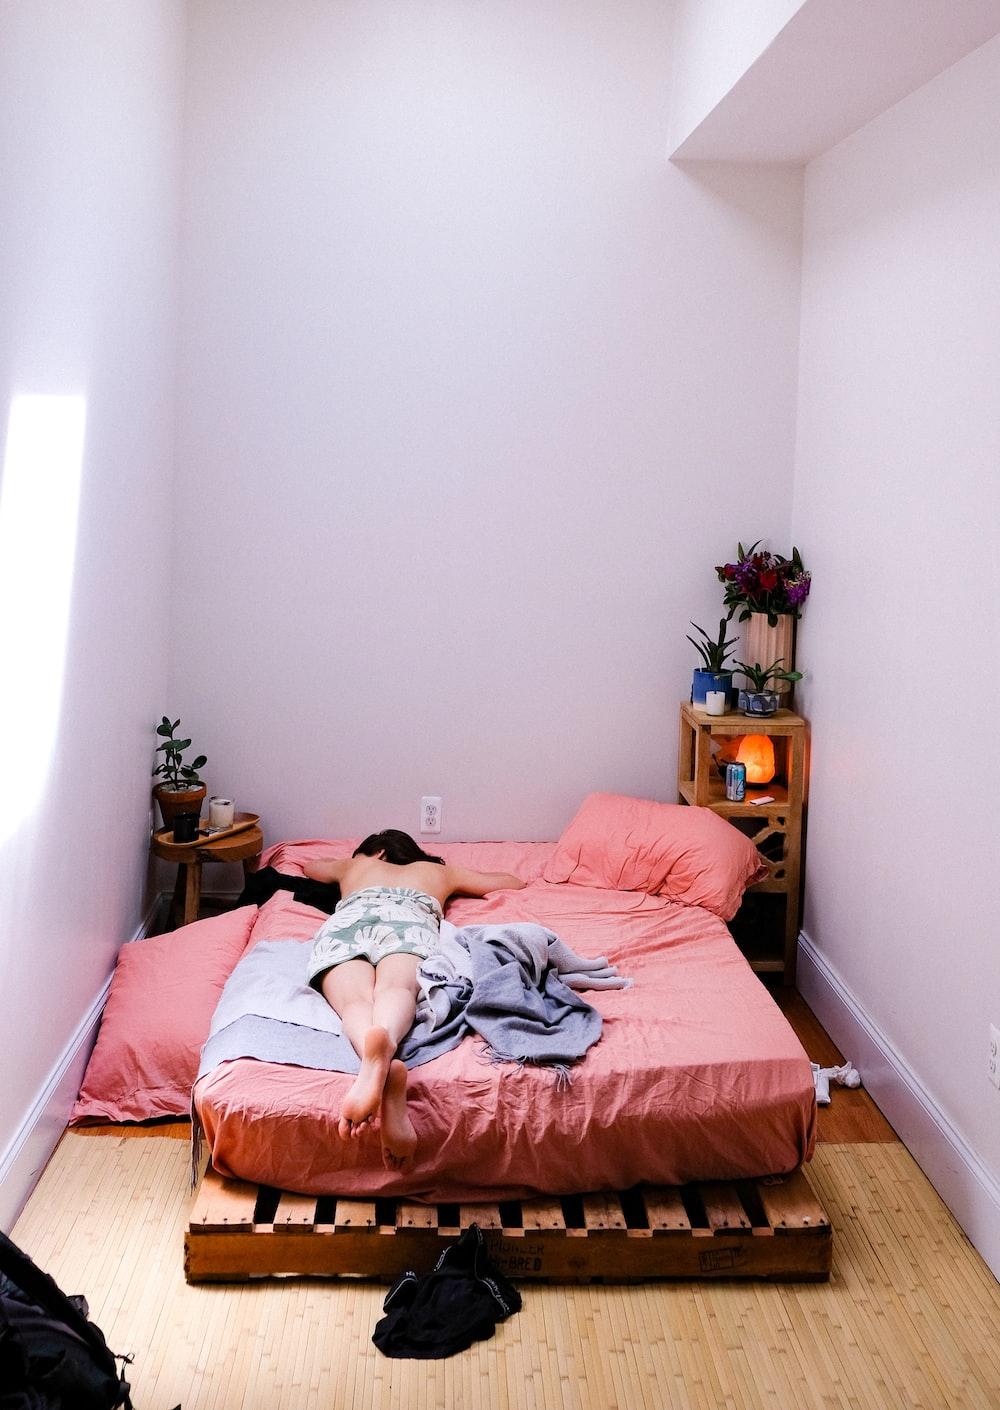 person lying on pink mattress